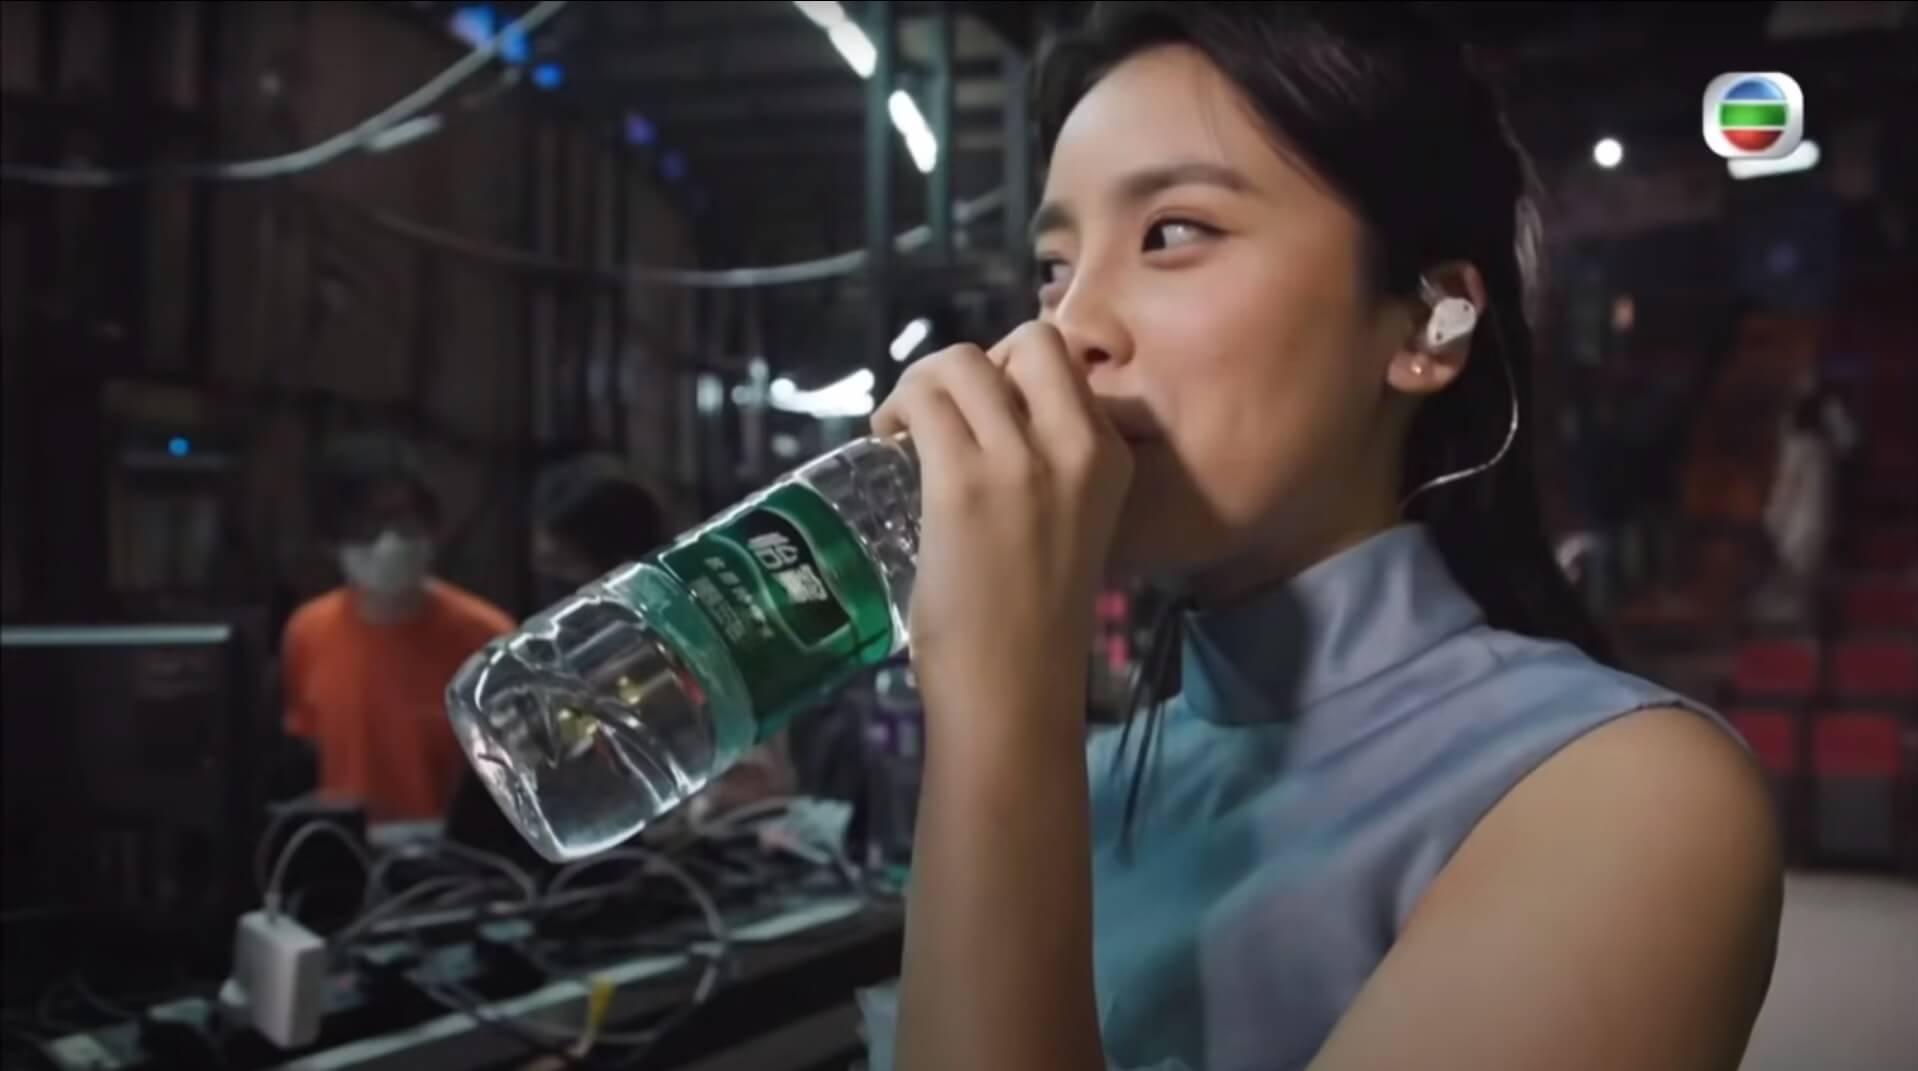 Chantel賽後喝水的片段也吸引5萬人觀看